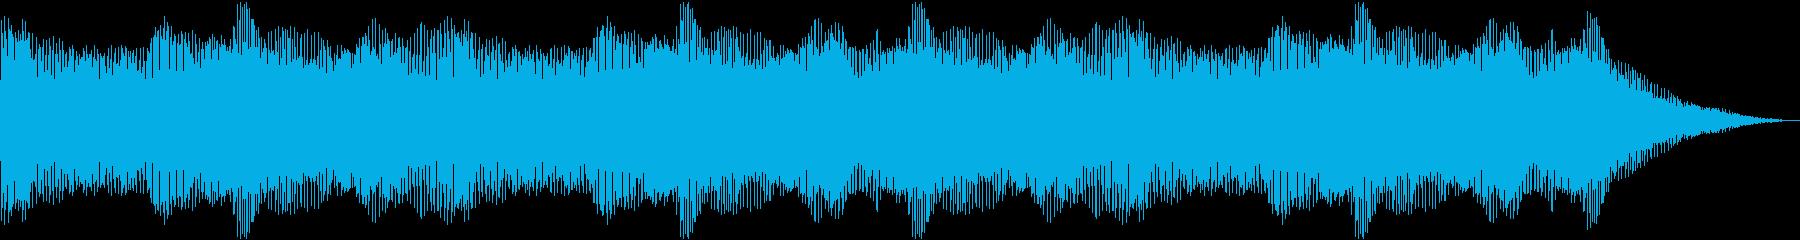 CINEMATIC DRONE 01の再生済みの波形